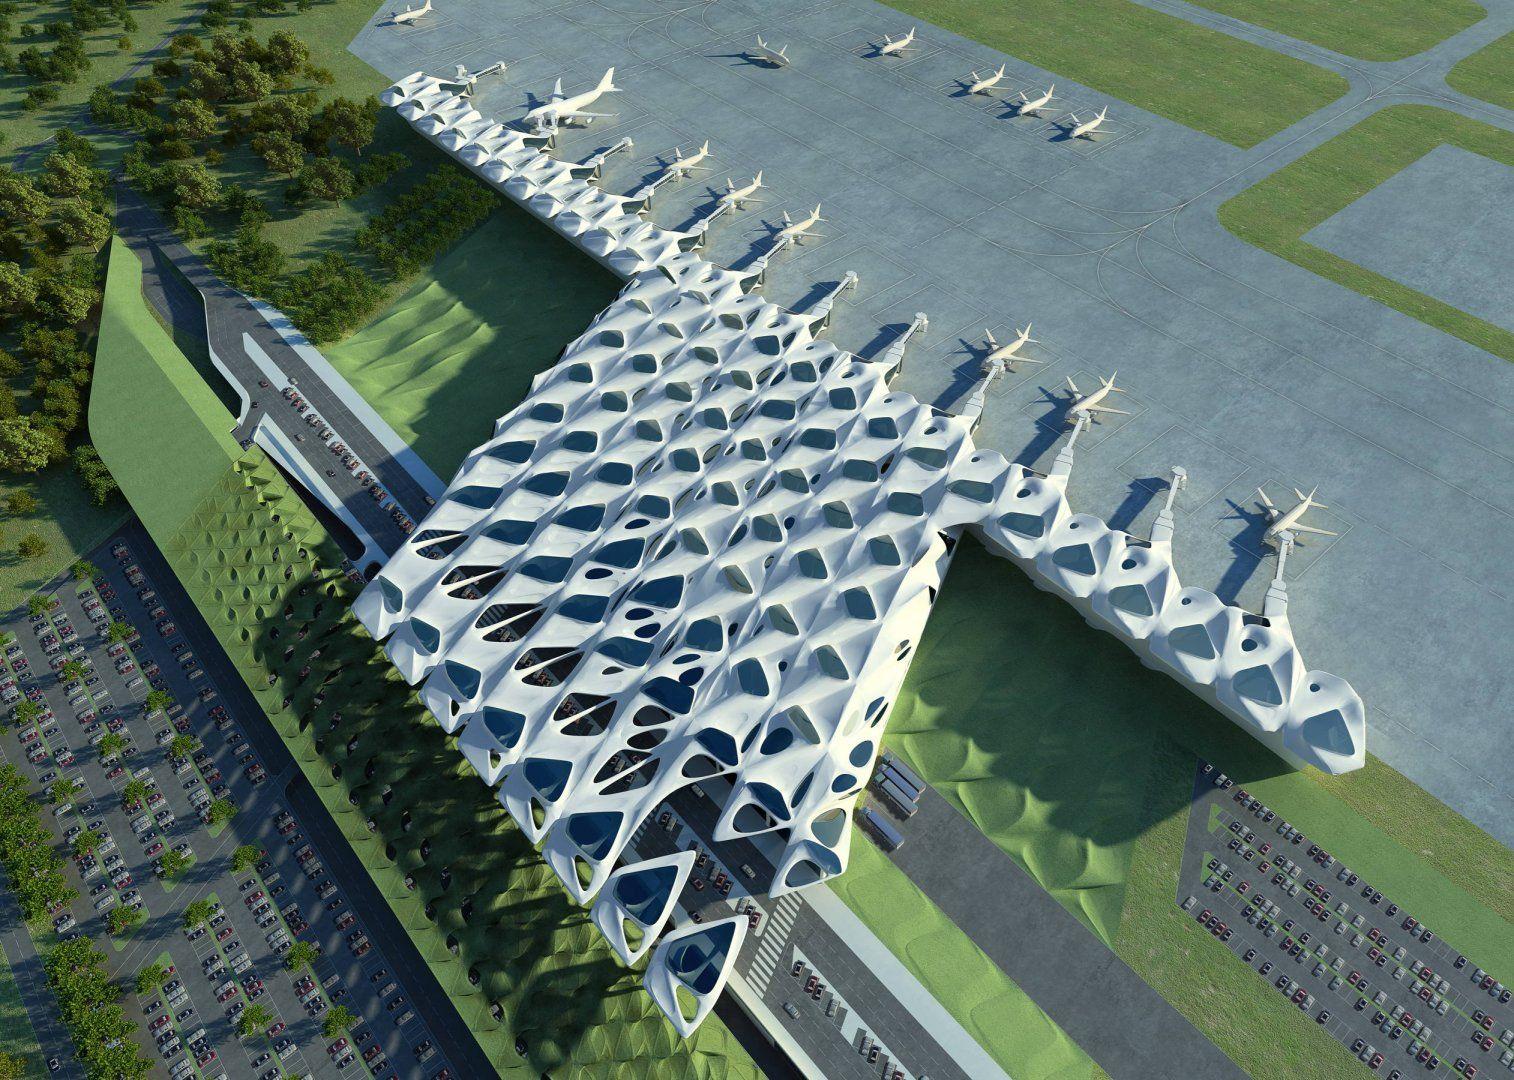 New Passenger Terminal And Masterplan Zagreb Airport Masterplans Zaha Hadid Architects Arquitectura Diseno Urbano Arquitectos